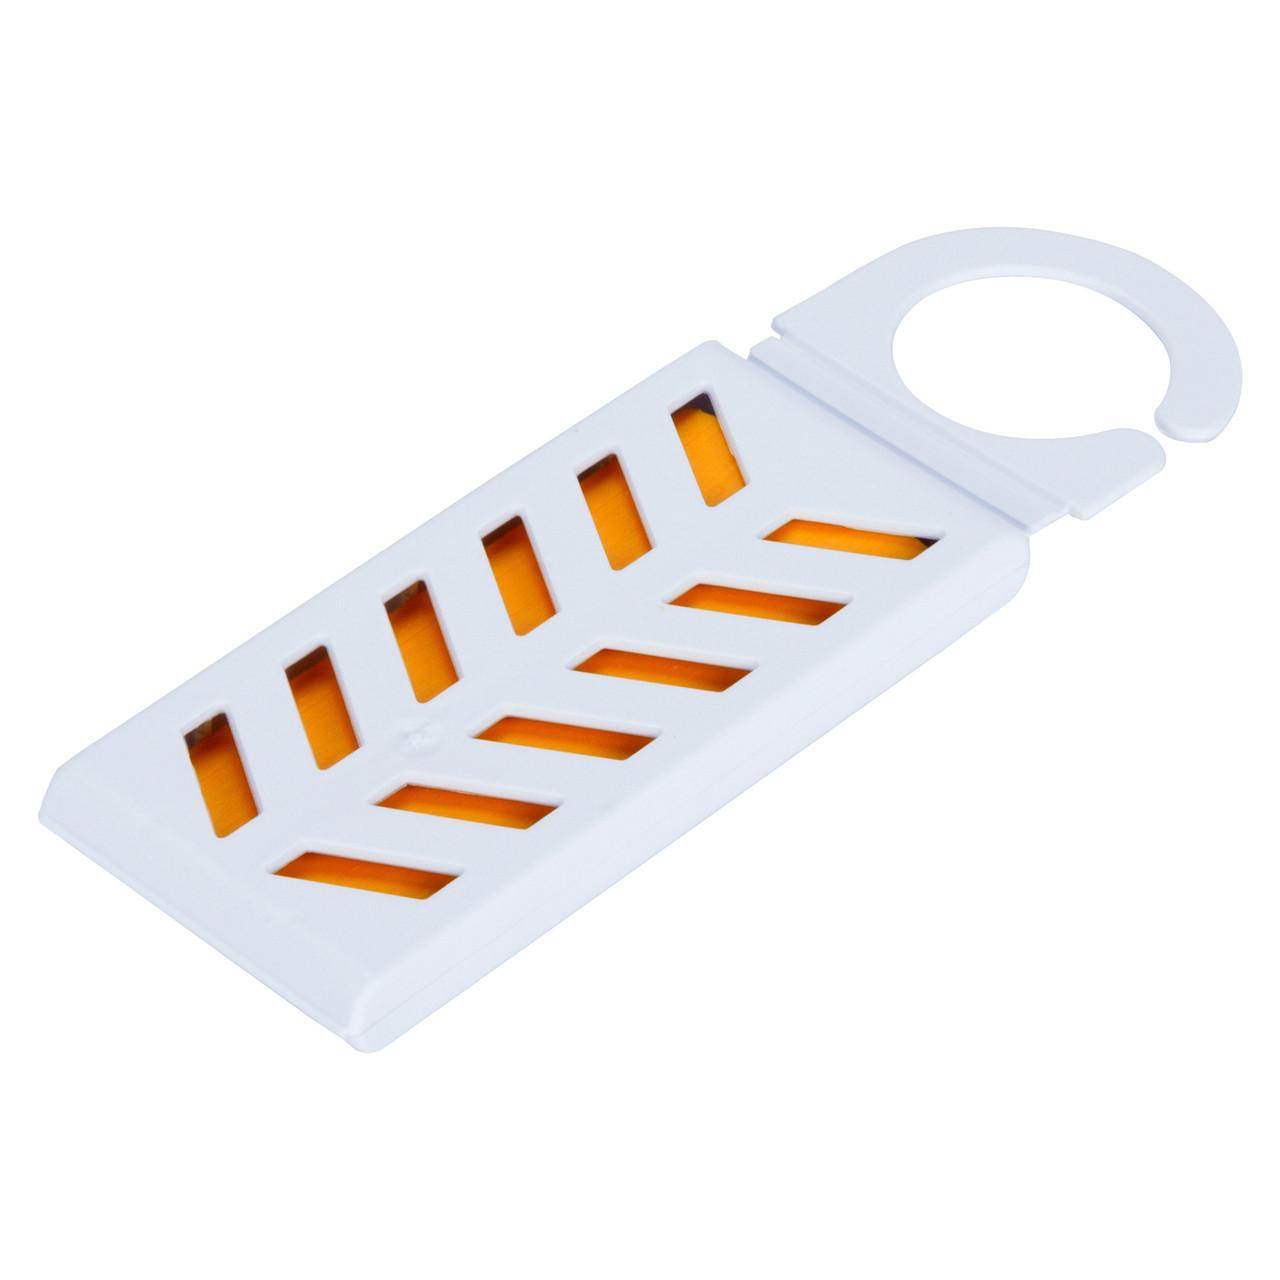 Fruit Fly Bar Pro (10-Pack) Insecticide Vapor Strip